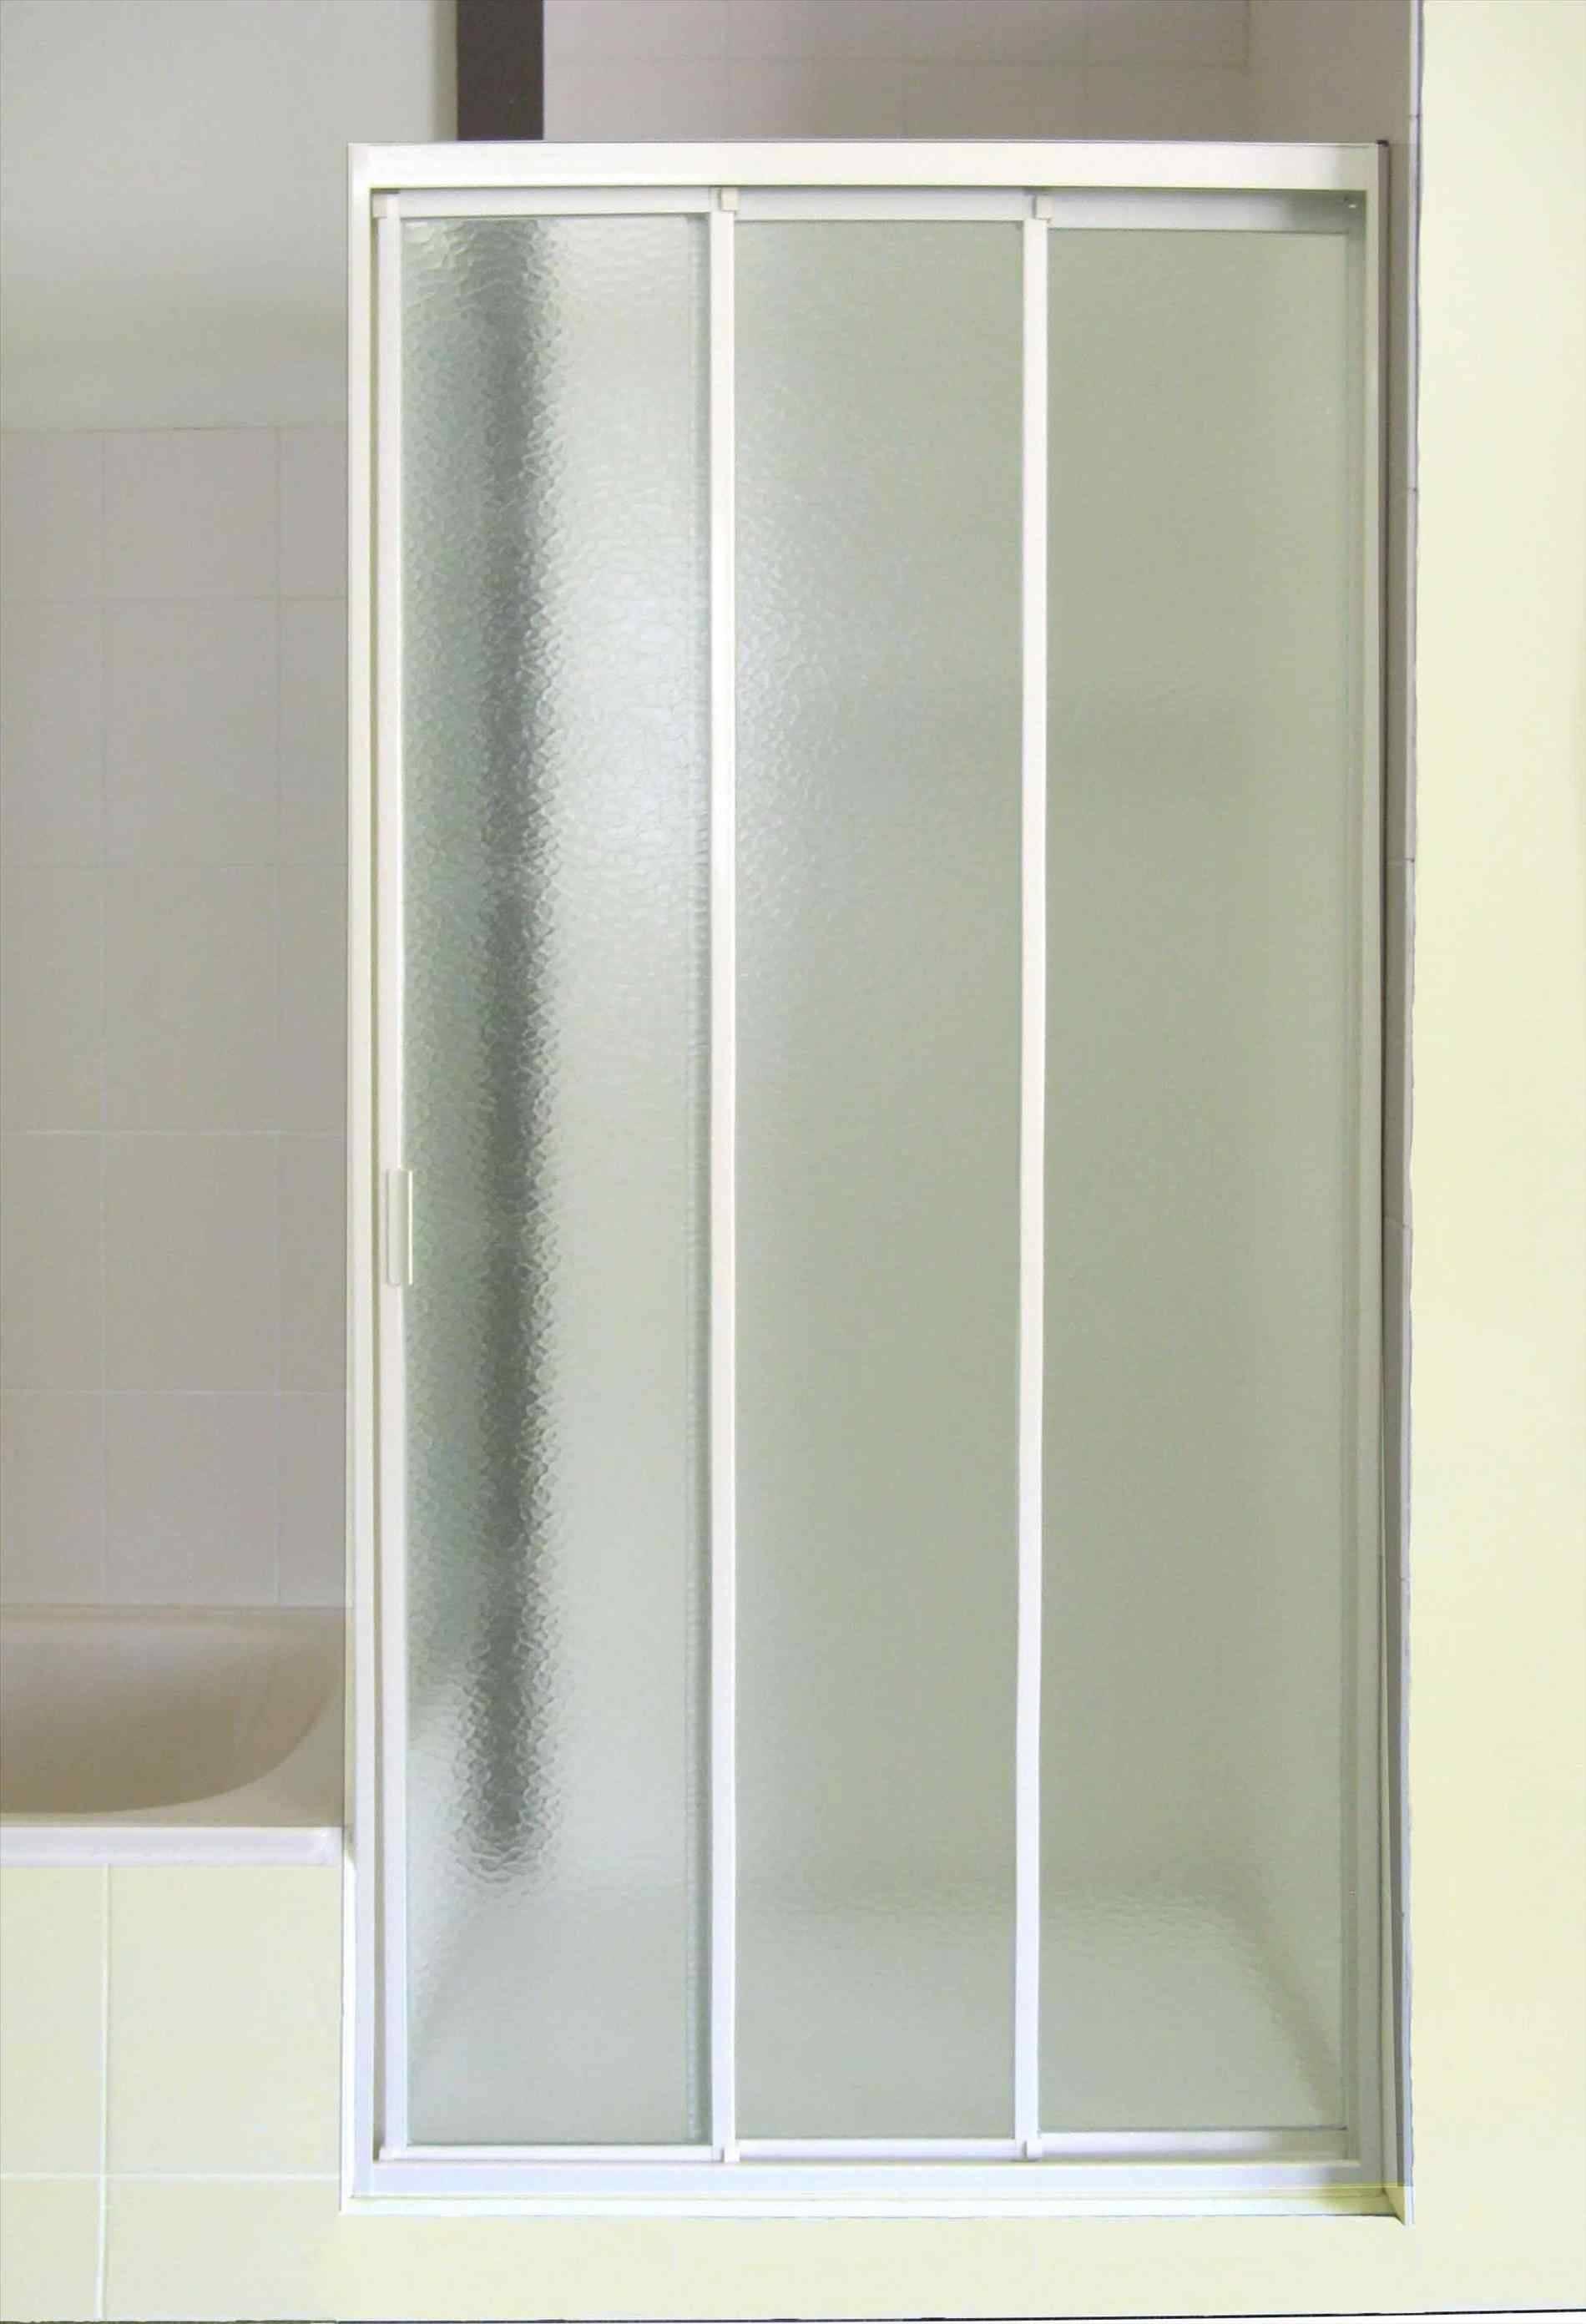 Over Bath Sliding Shower Screens Athelred